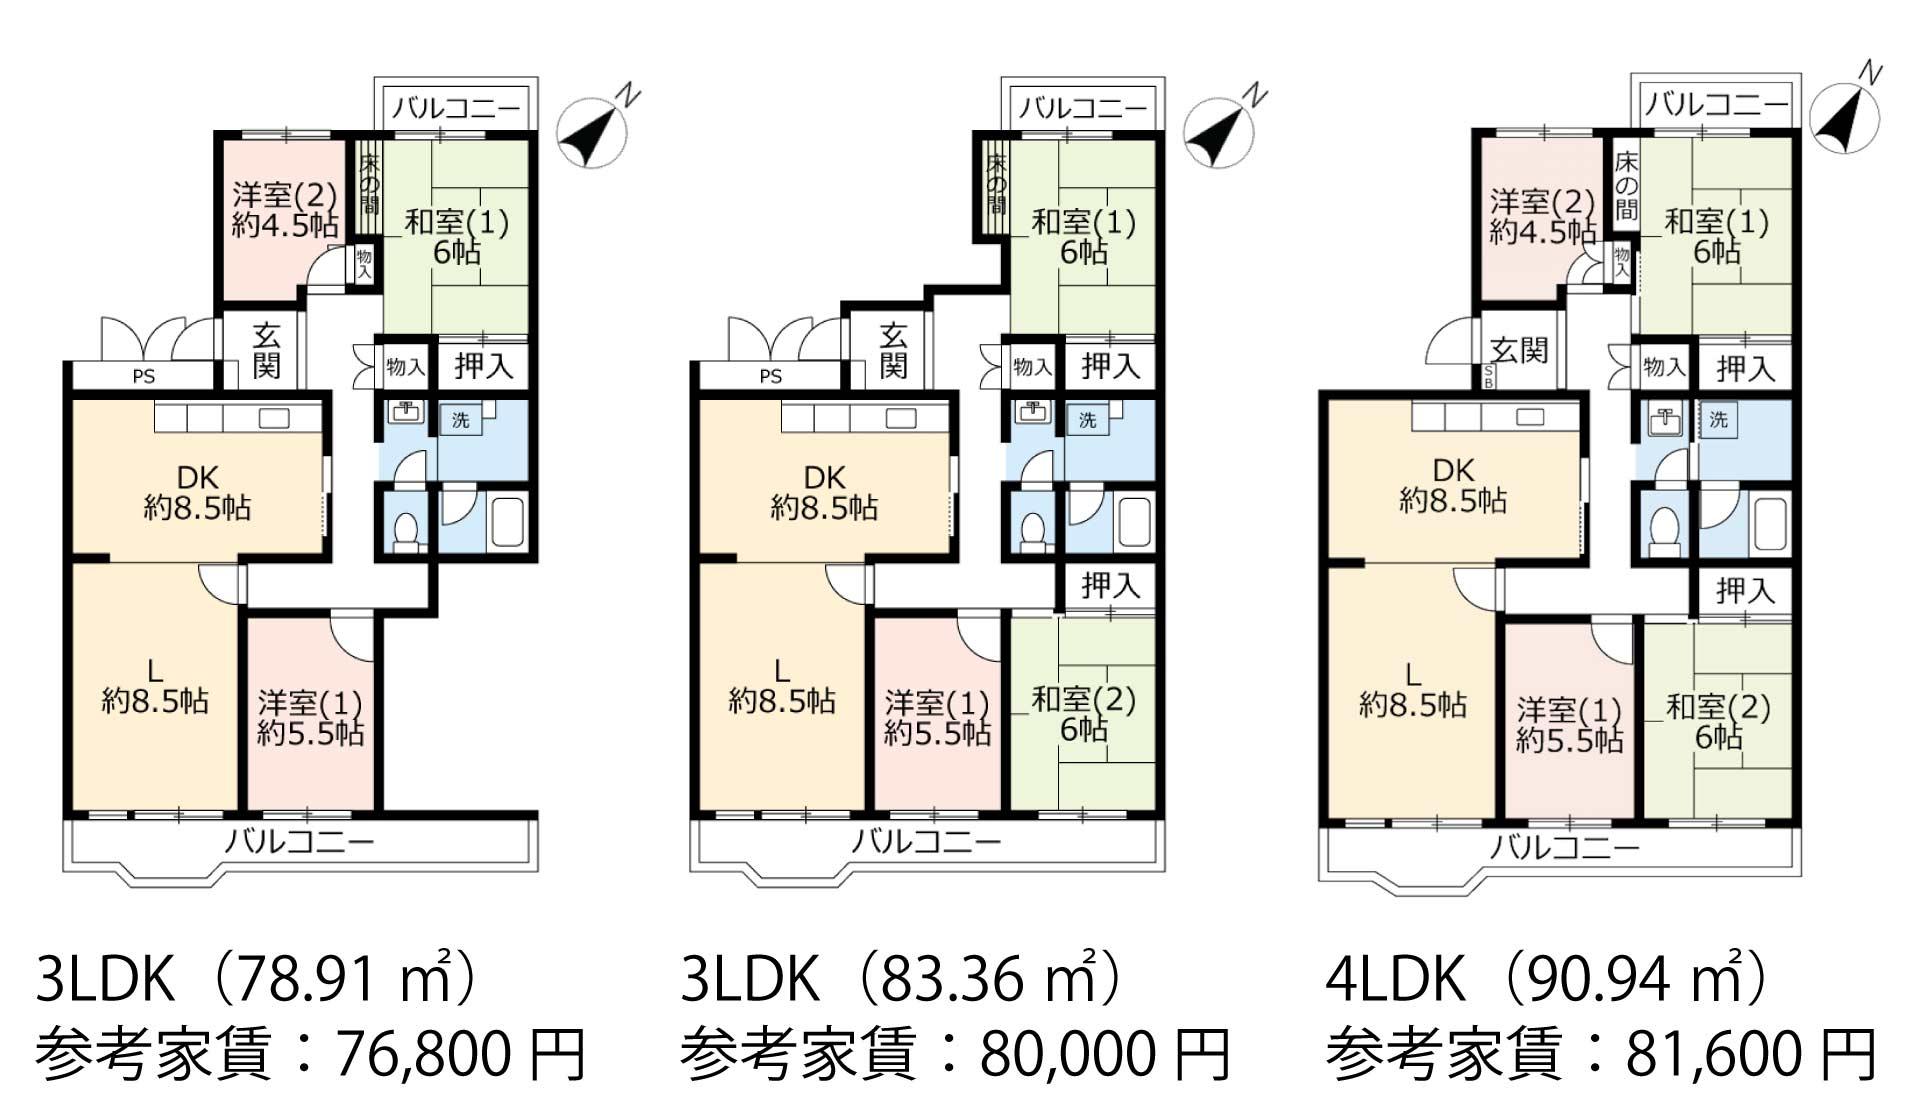 3LDK、4LDKへと間取りを変更できる、おもしろいお部屋です